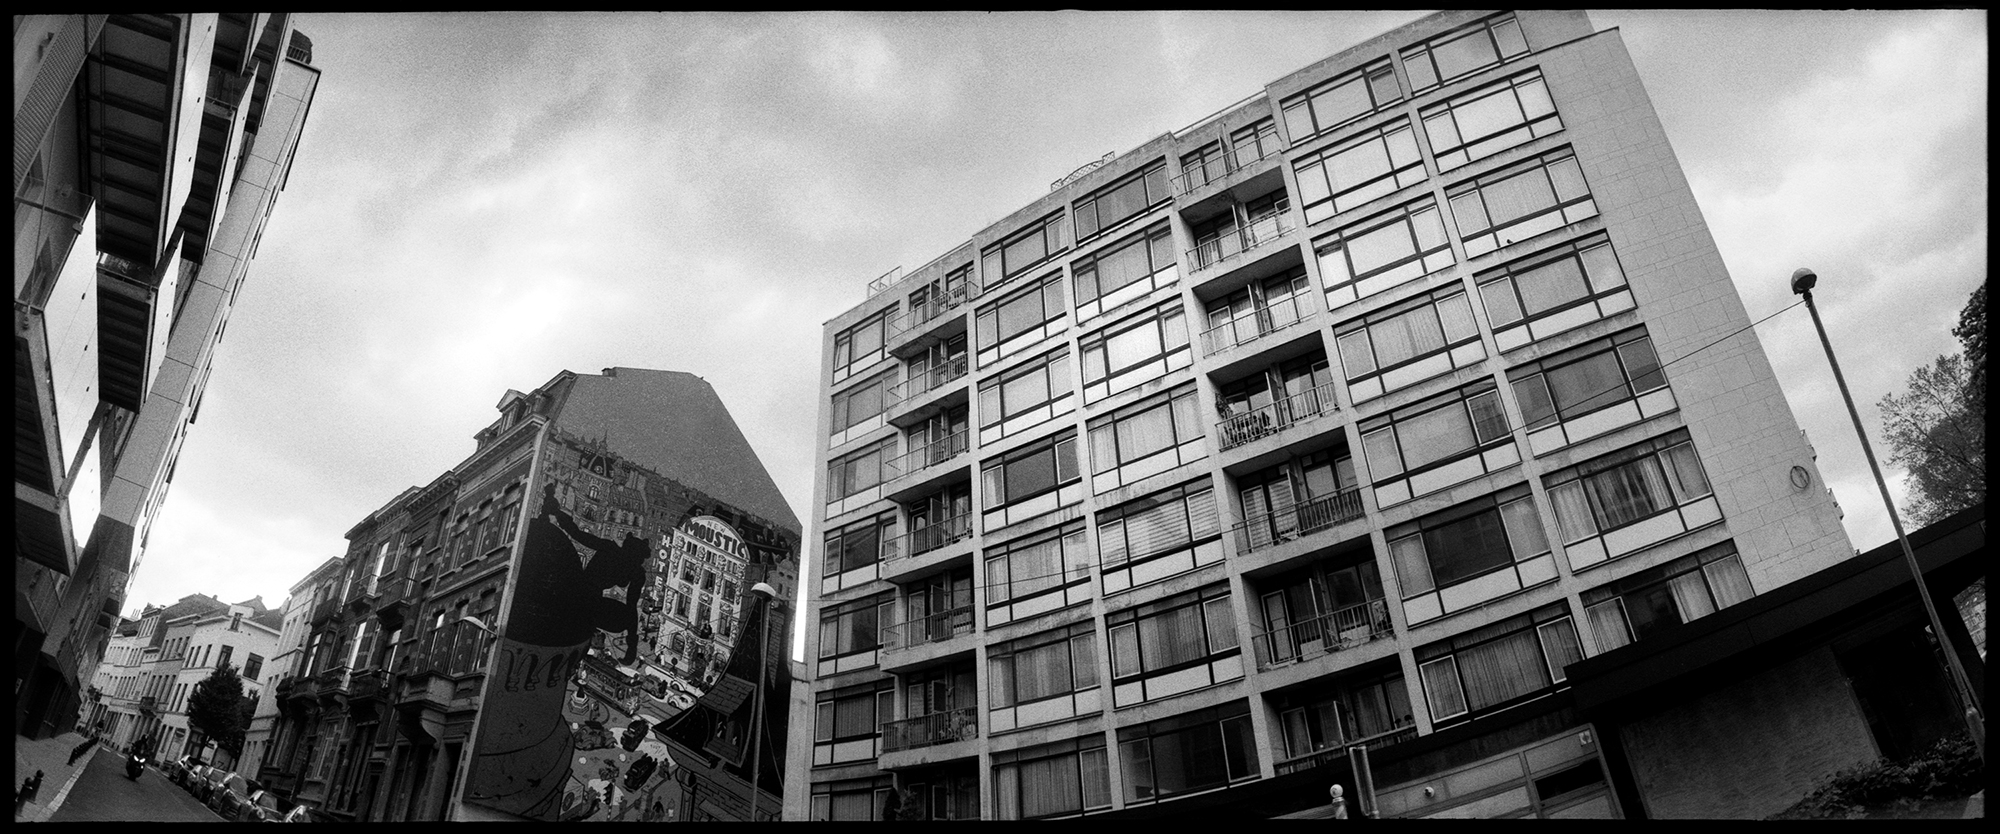 Brussels, Belgium by Laurent Orseau #69